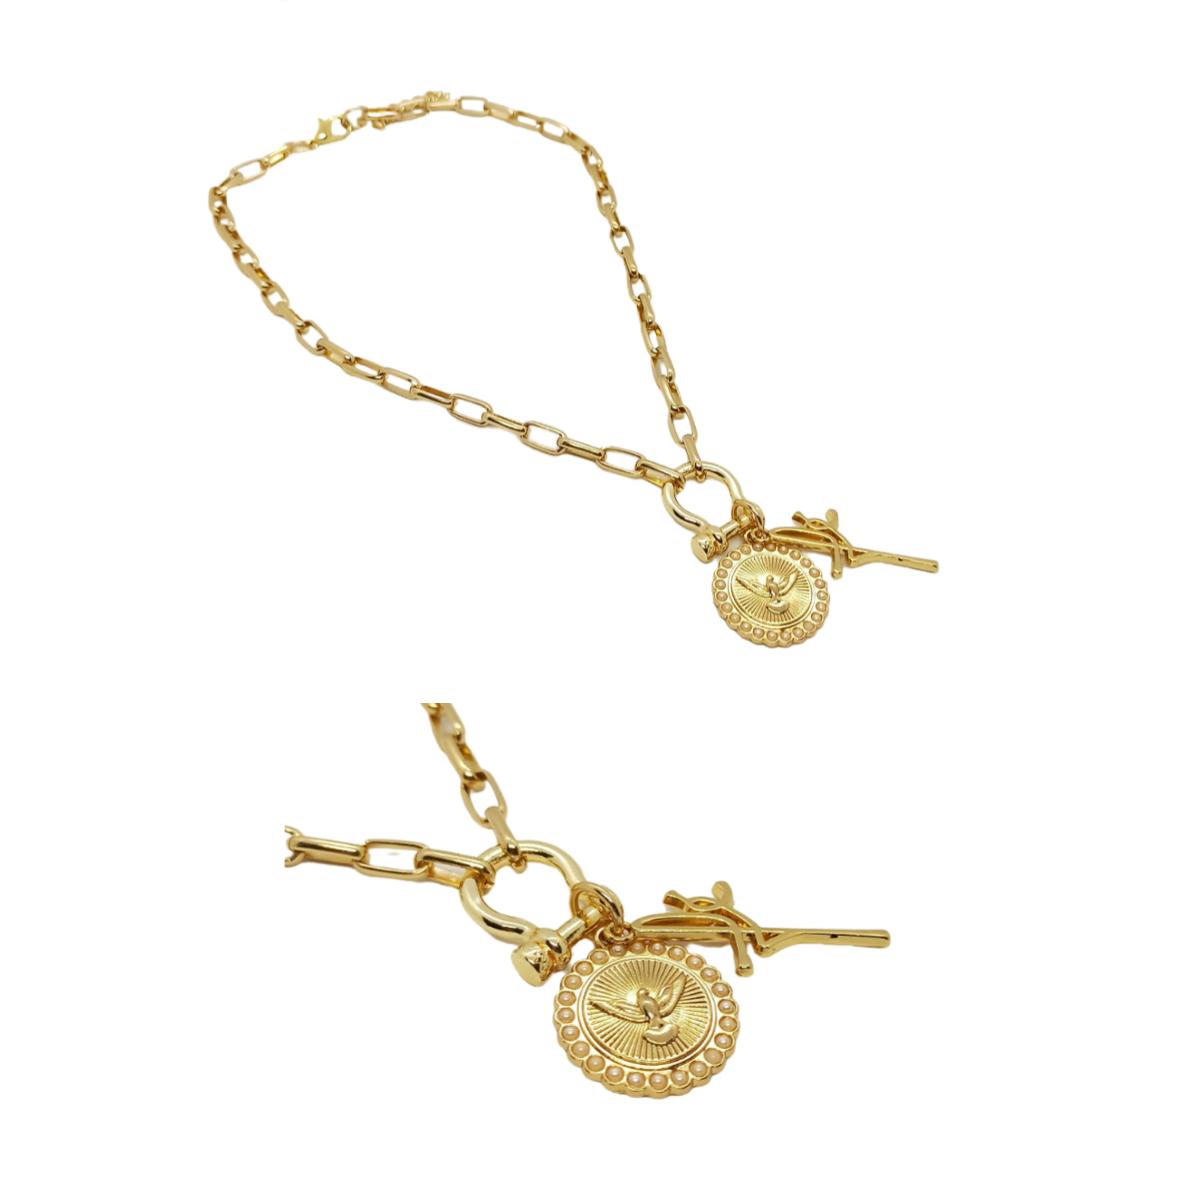 Colar / Corrente Fé e Medalha Espirito Santo, Dourado.